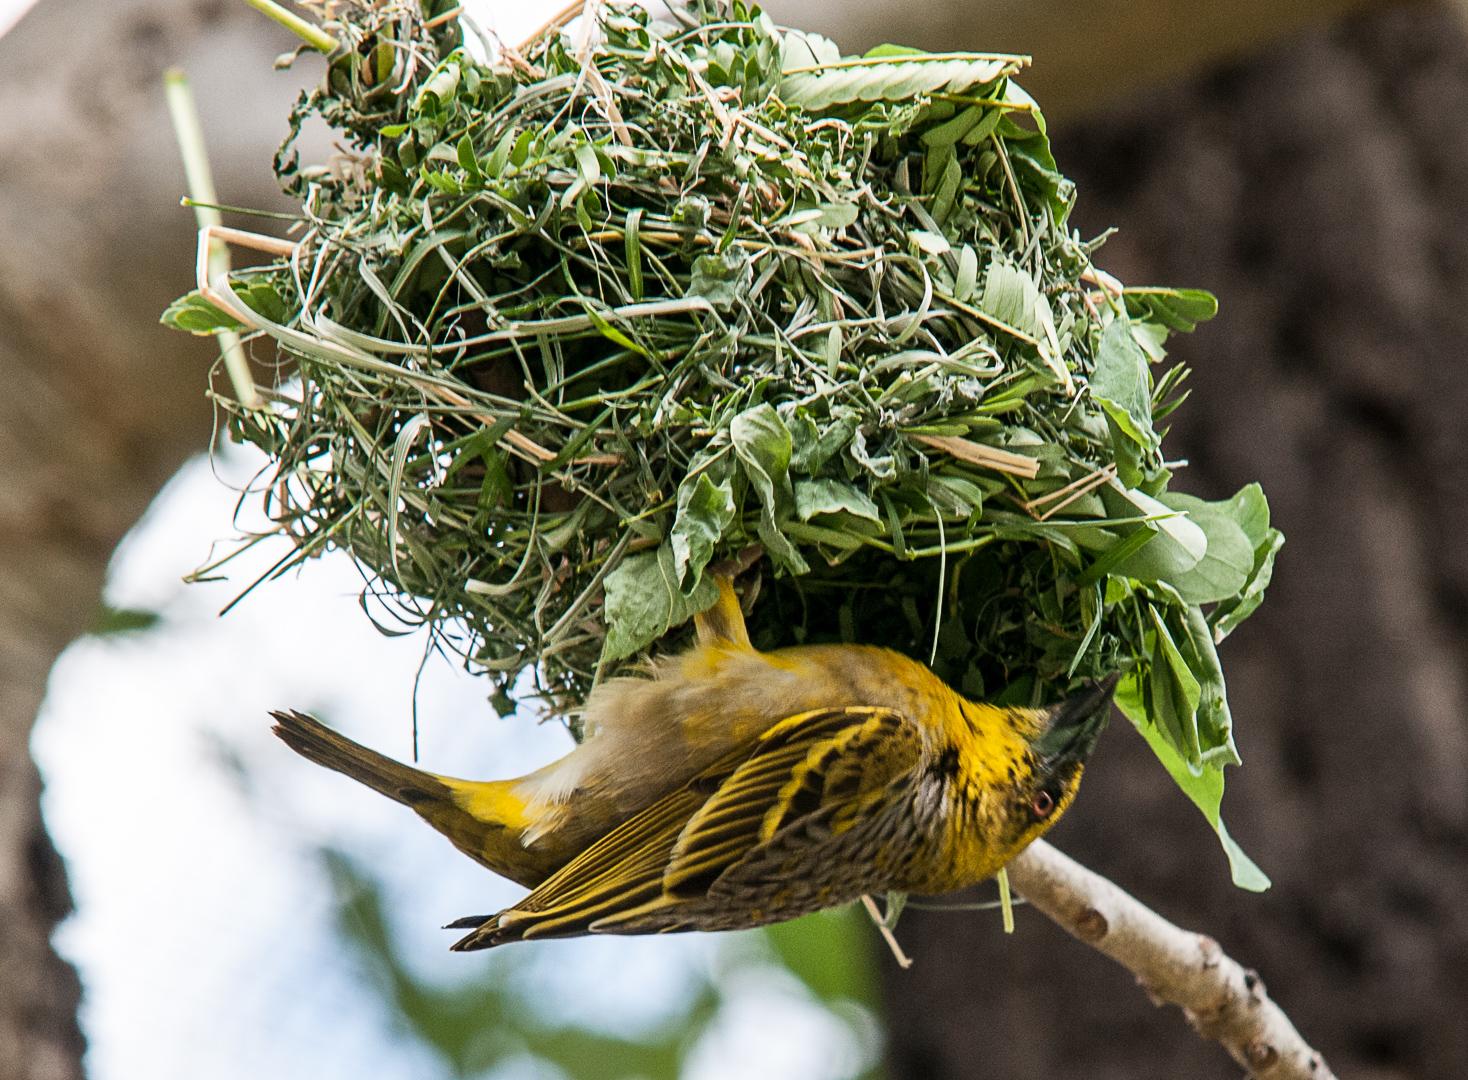 Vogel im Netz